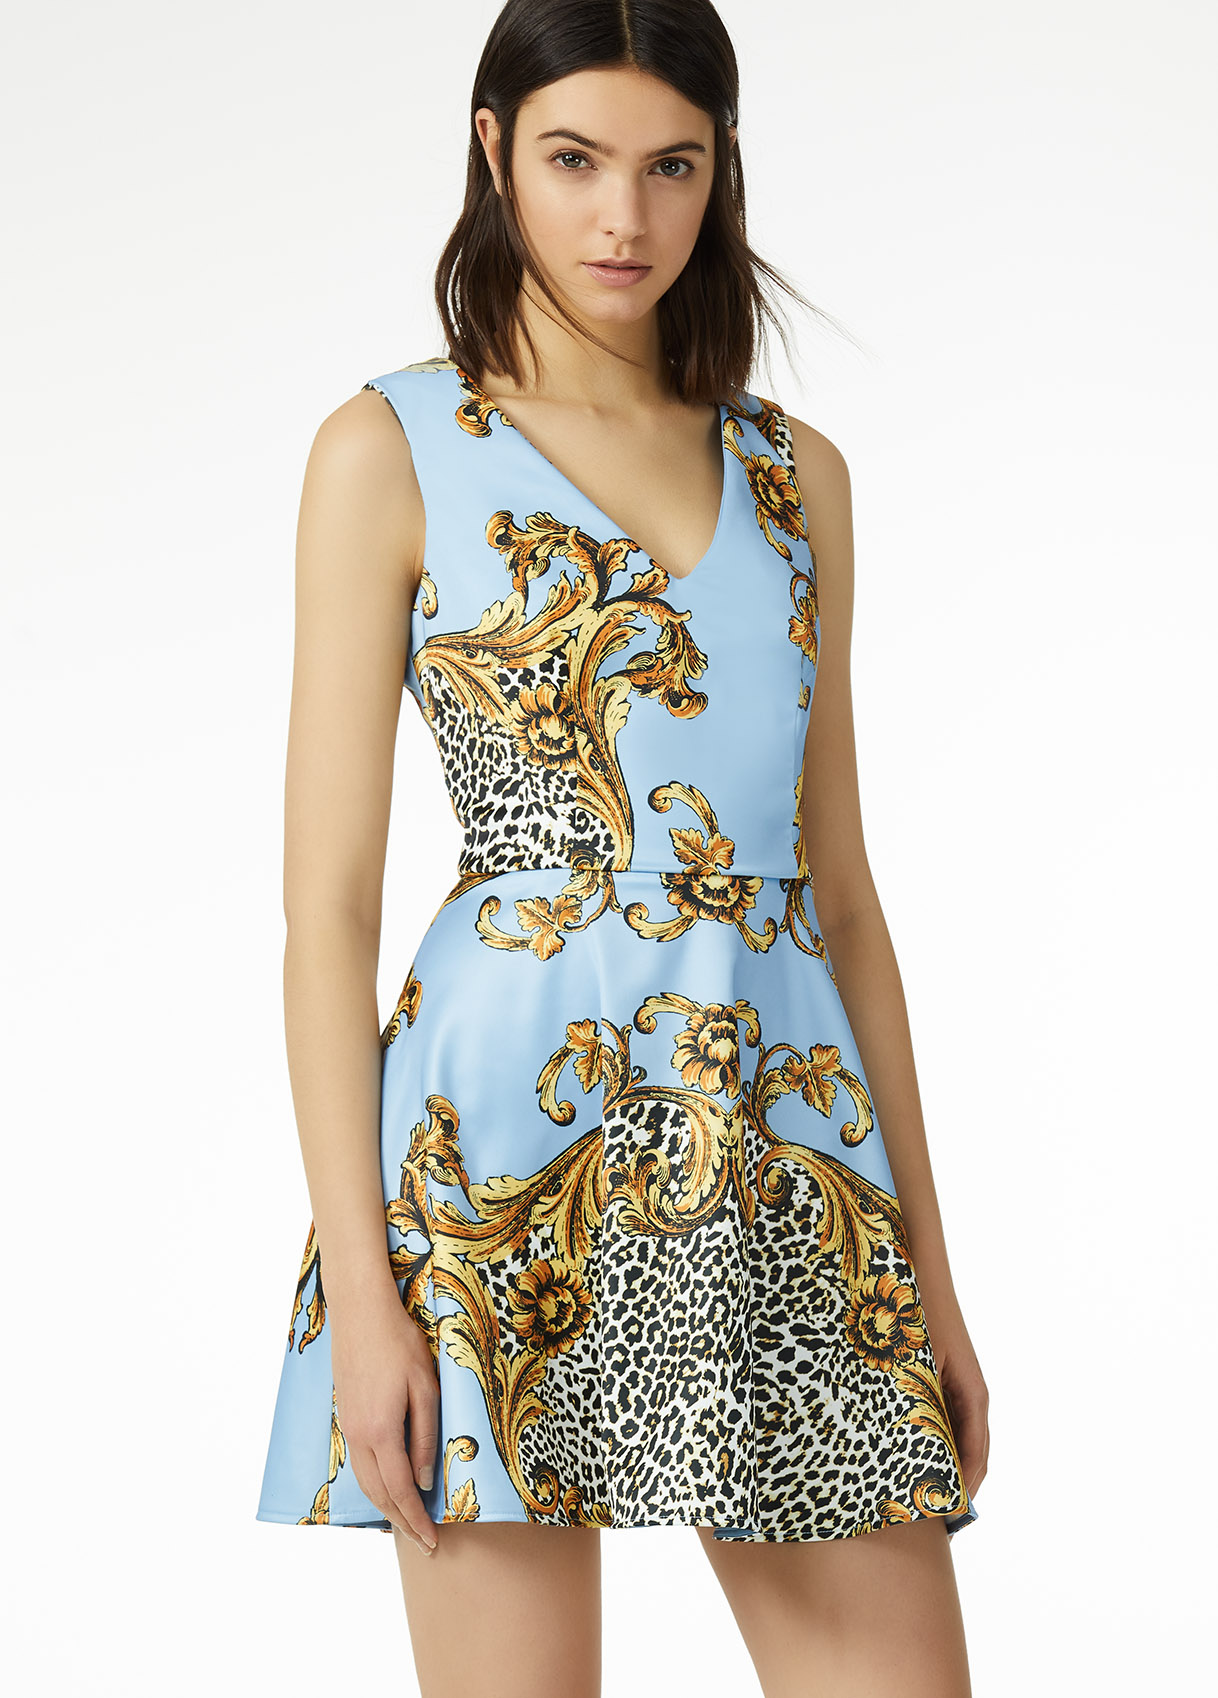 LiuJO–dresses-shortdresses-w19468t2289v9837-i-af-n-n-01-n